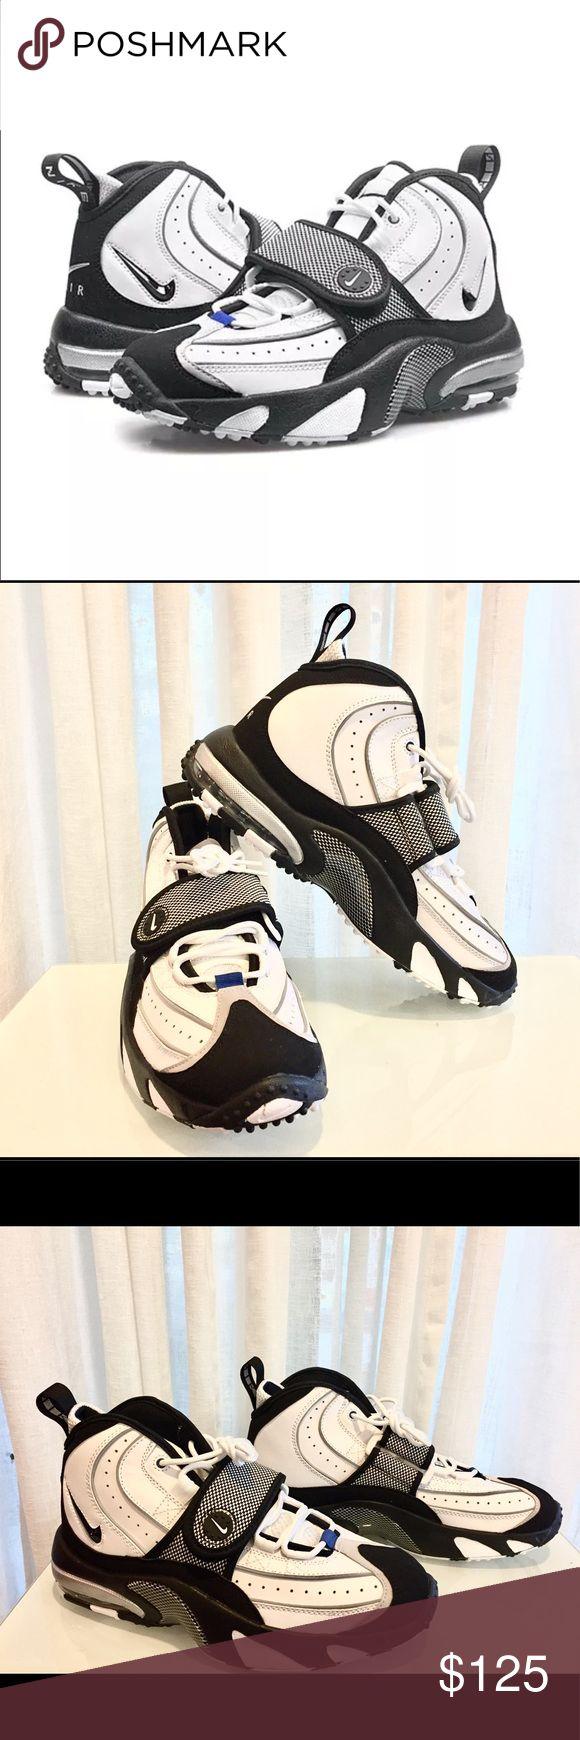 Nike Air Max Pro Streak White Men Turf Training s8 NWB (no box top) Nike Air Max Pro Streak White Black Men's Turf Training 684711 100 Size 8 Nike Shoes Athletic Shoes